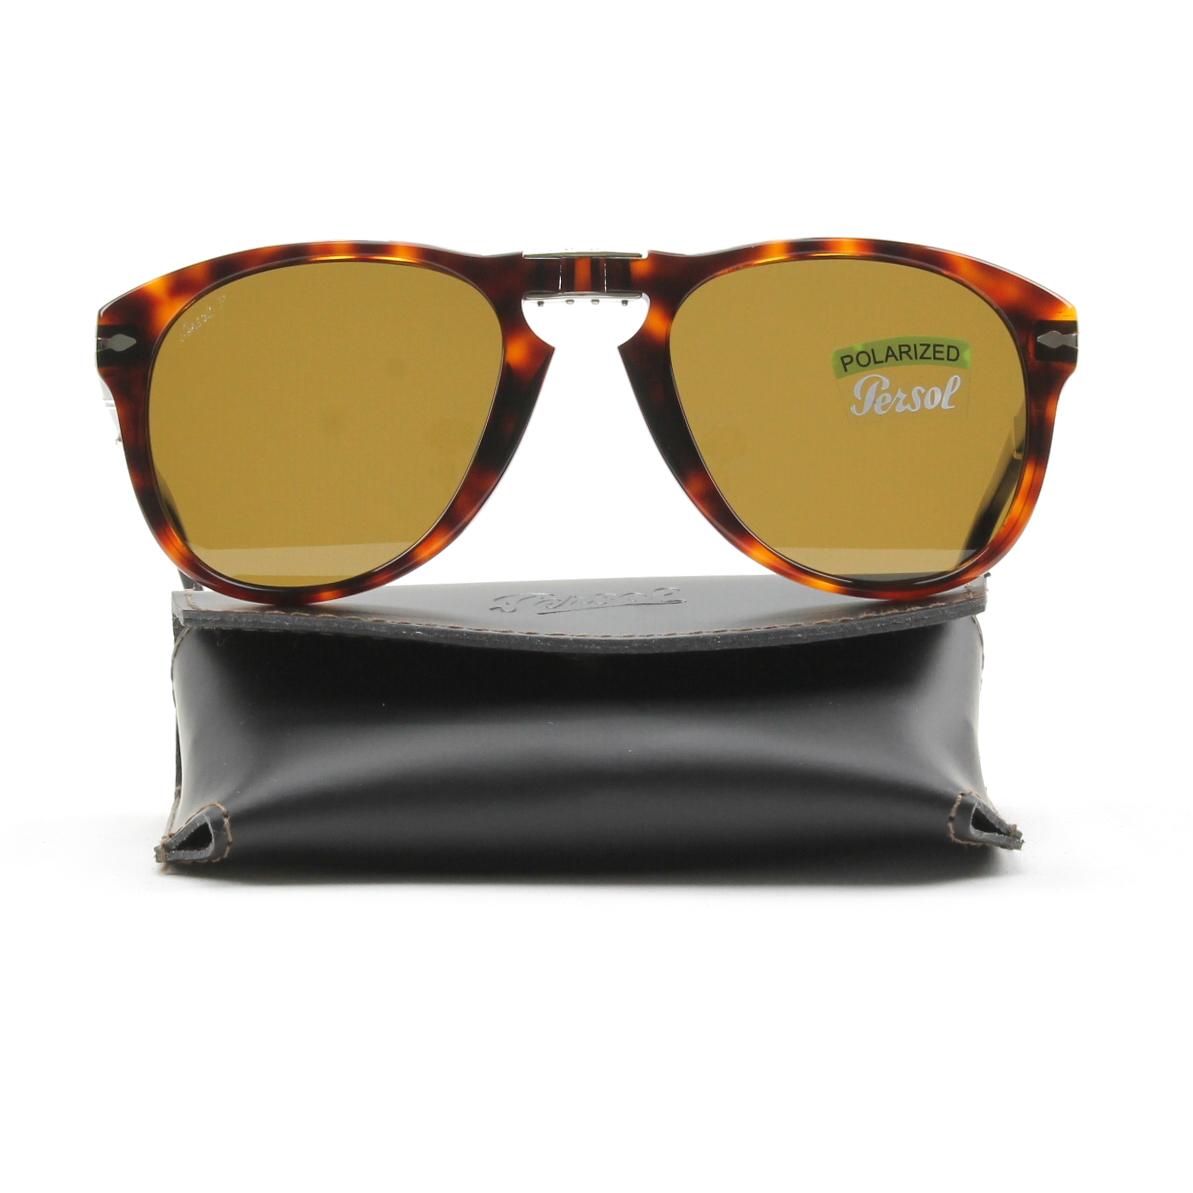 a6d05e70c1 Persol 714 Folding Sunglasses 24 57 Havana